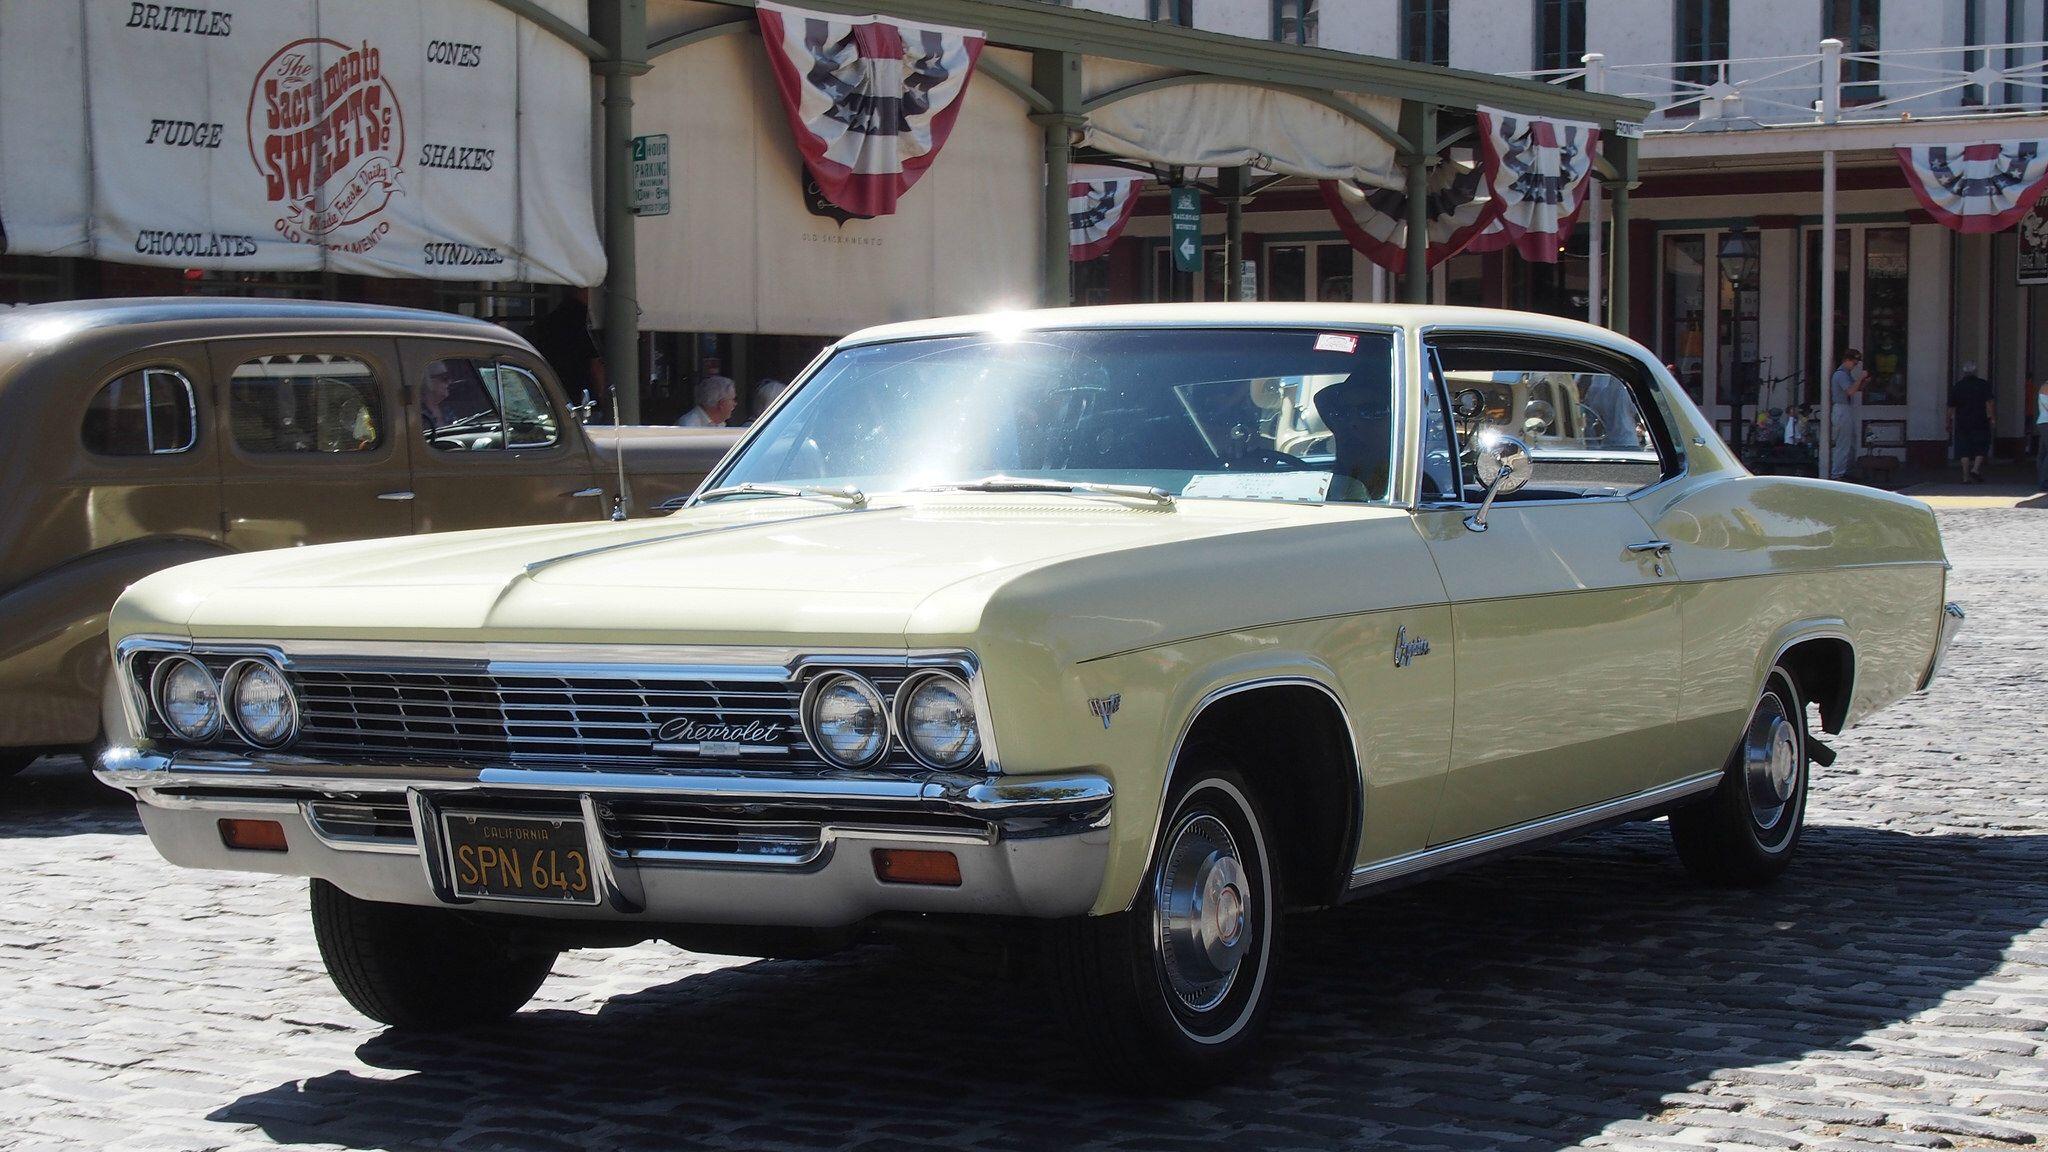 1966 Chevrolet Caprice Hardtiop 'SPN 643' 1